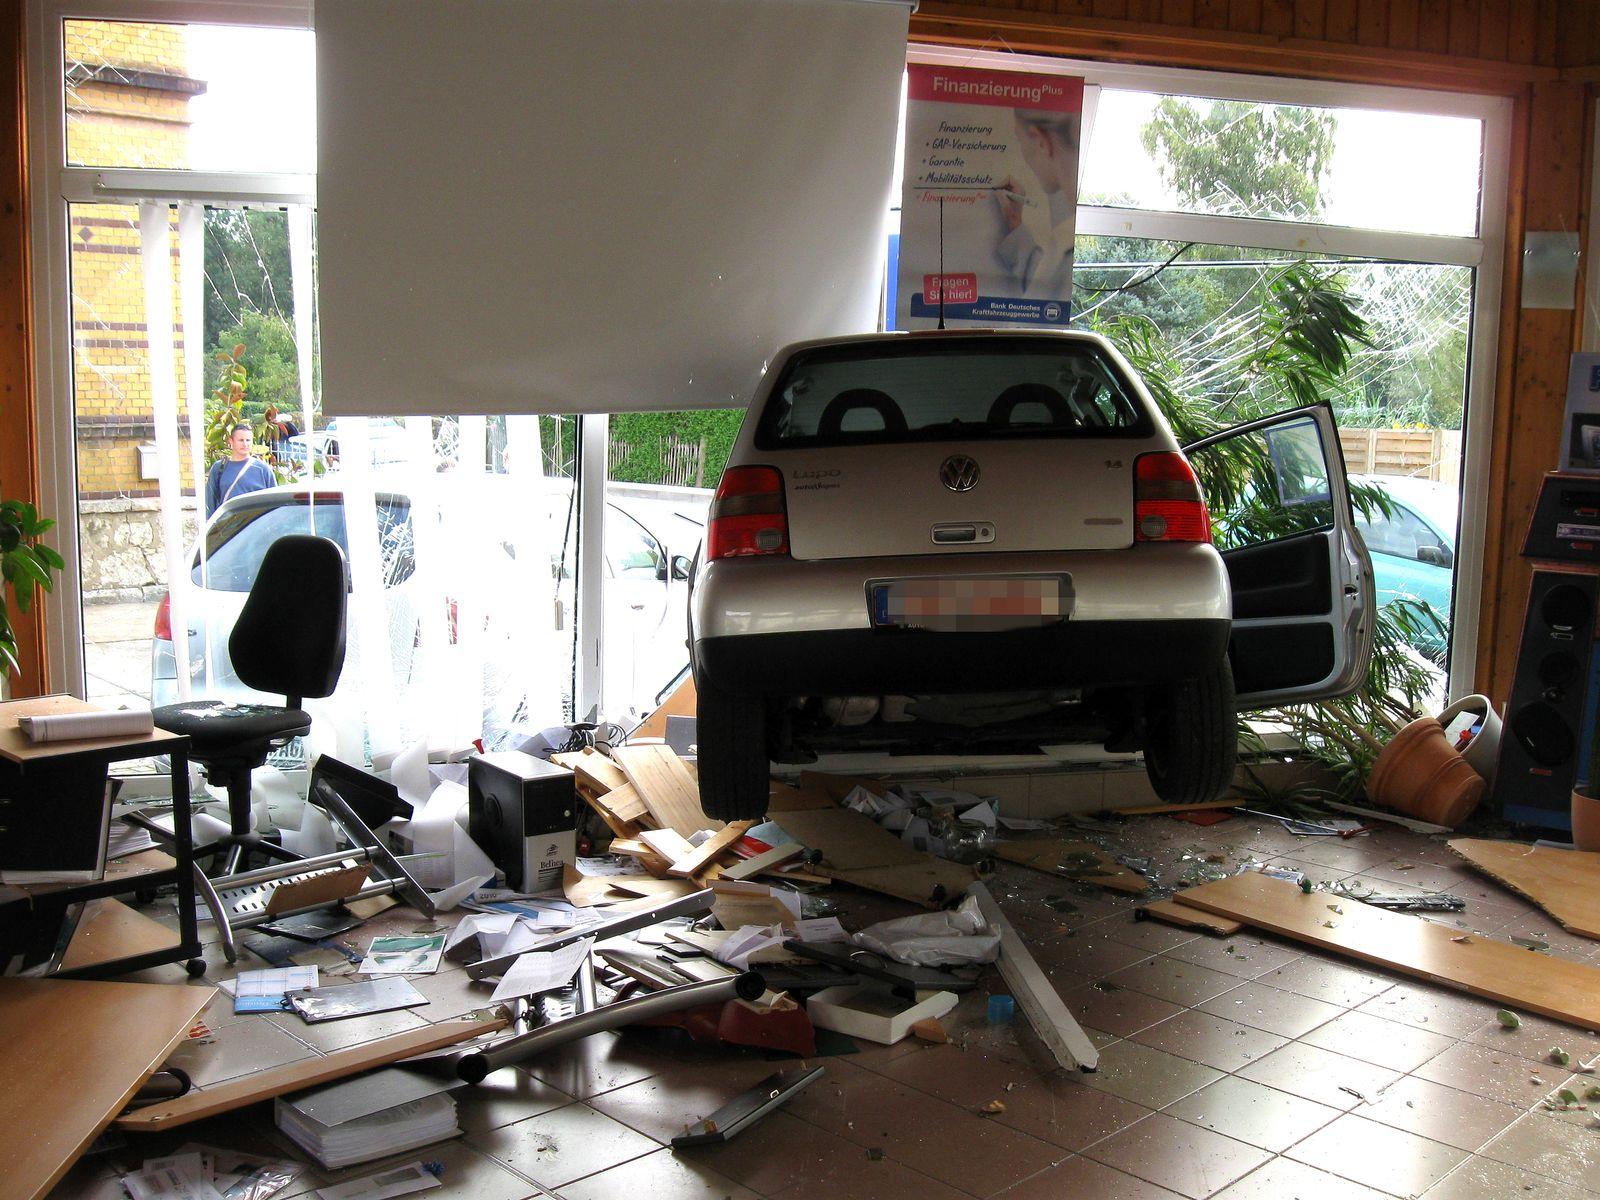 Apolda / Autohaus bei Probefahrt zerlegt